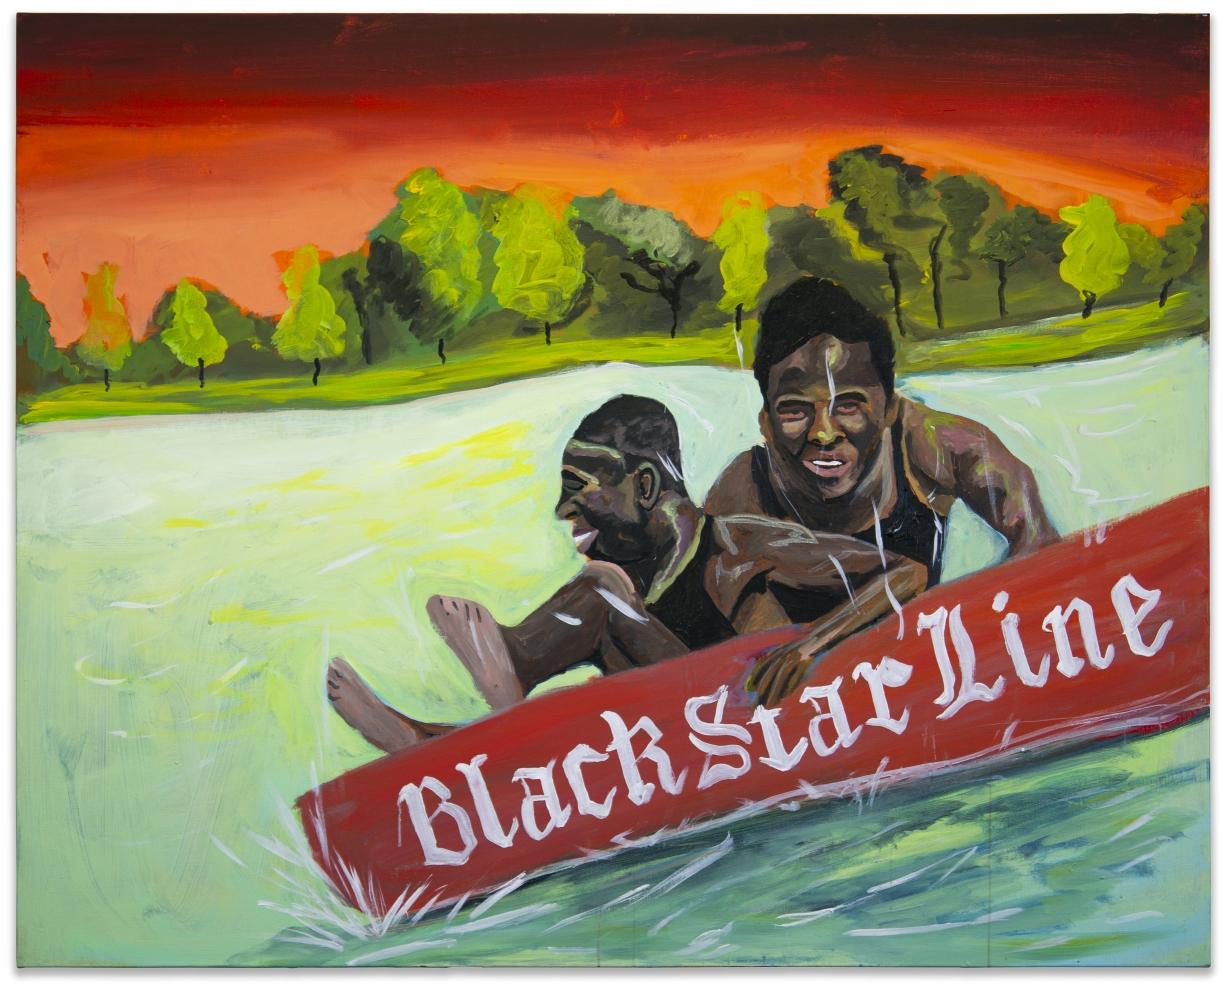 Marcus Brutus, Fantastic Voyage Aboard the Black Star Line, 2020